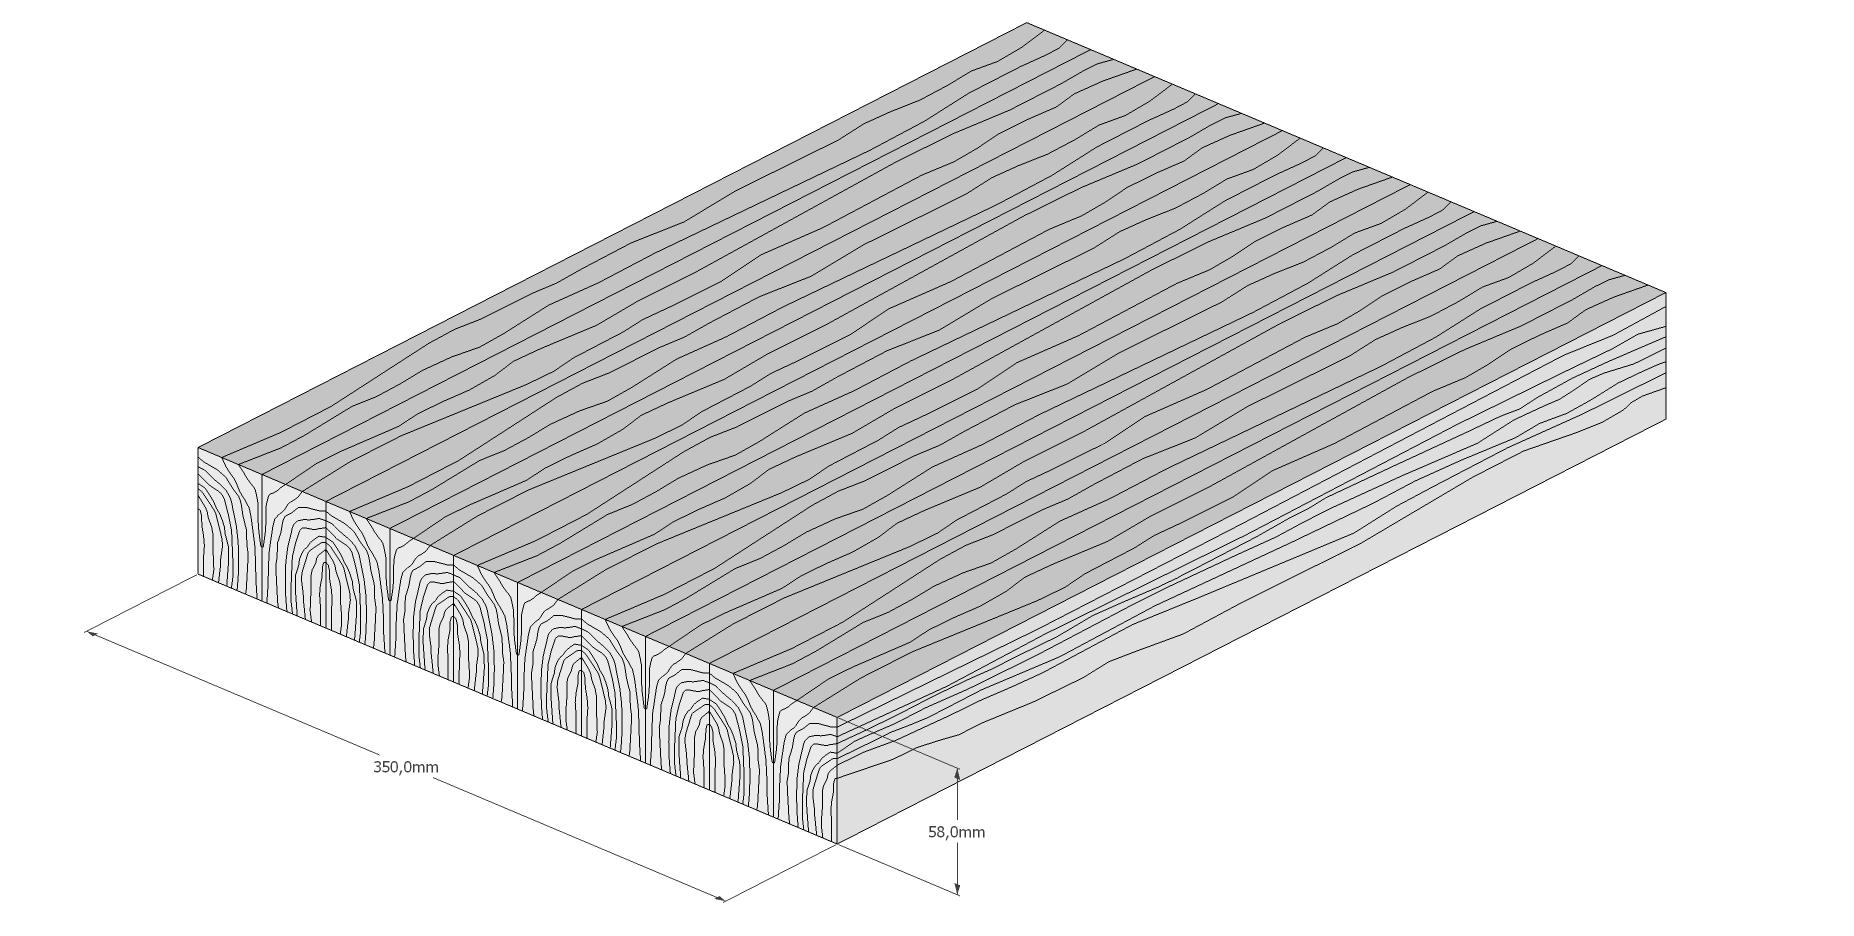 Holzschneidebrett Premium Brettevolution 1-6